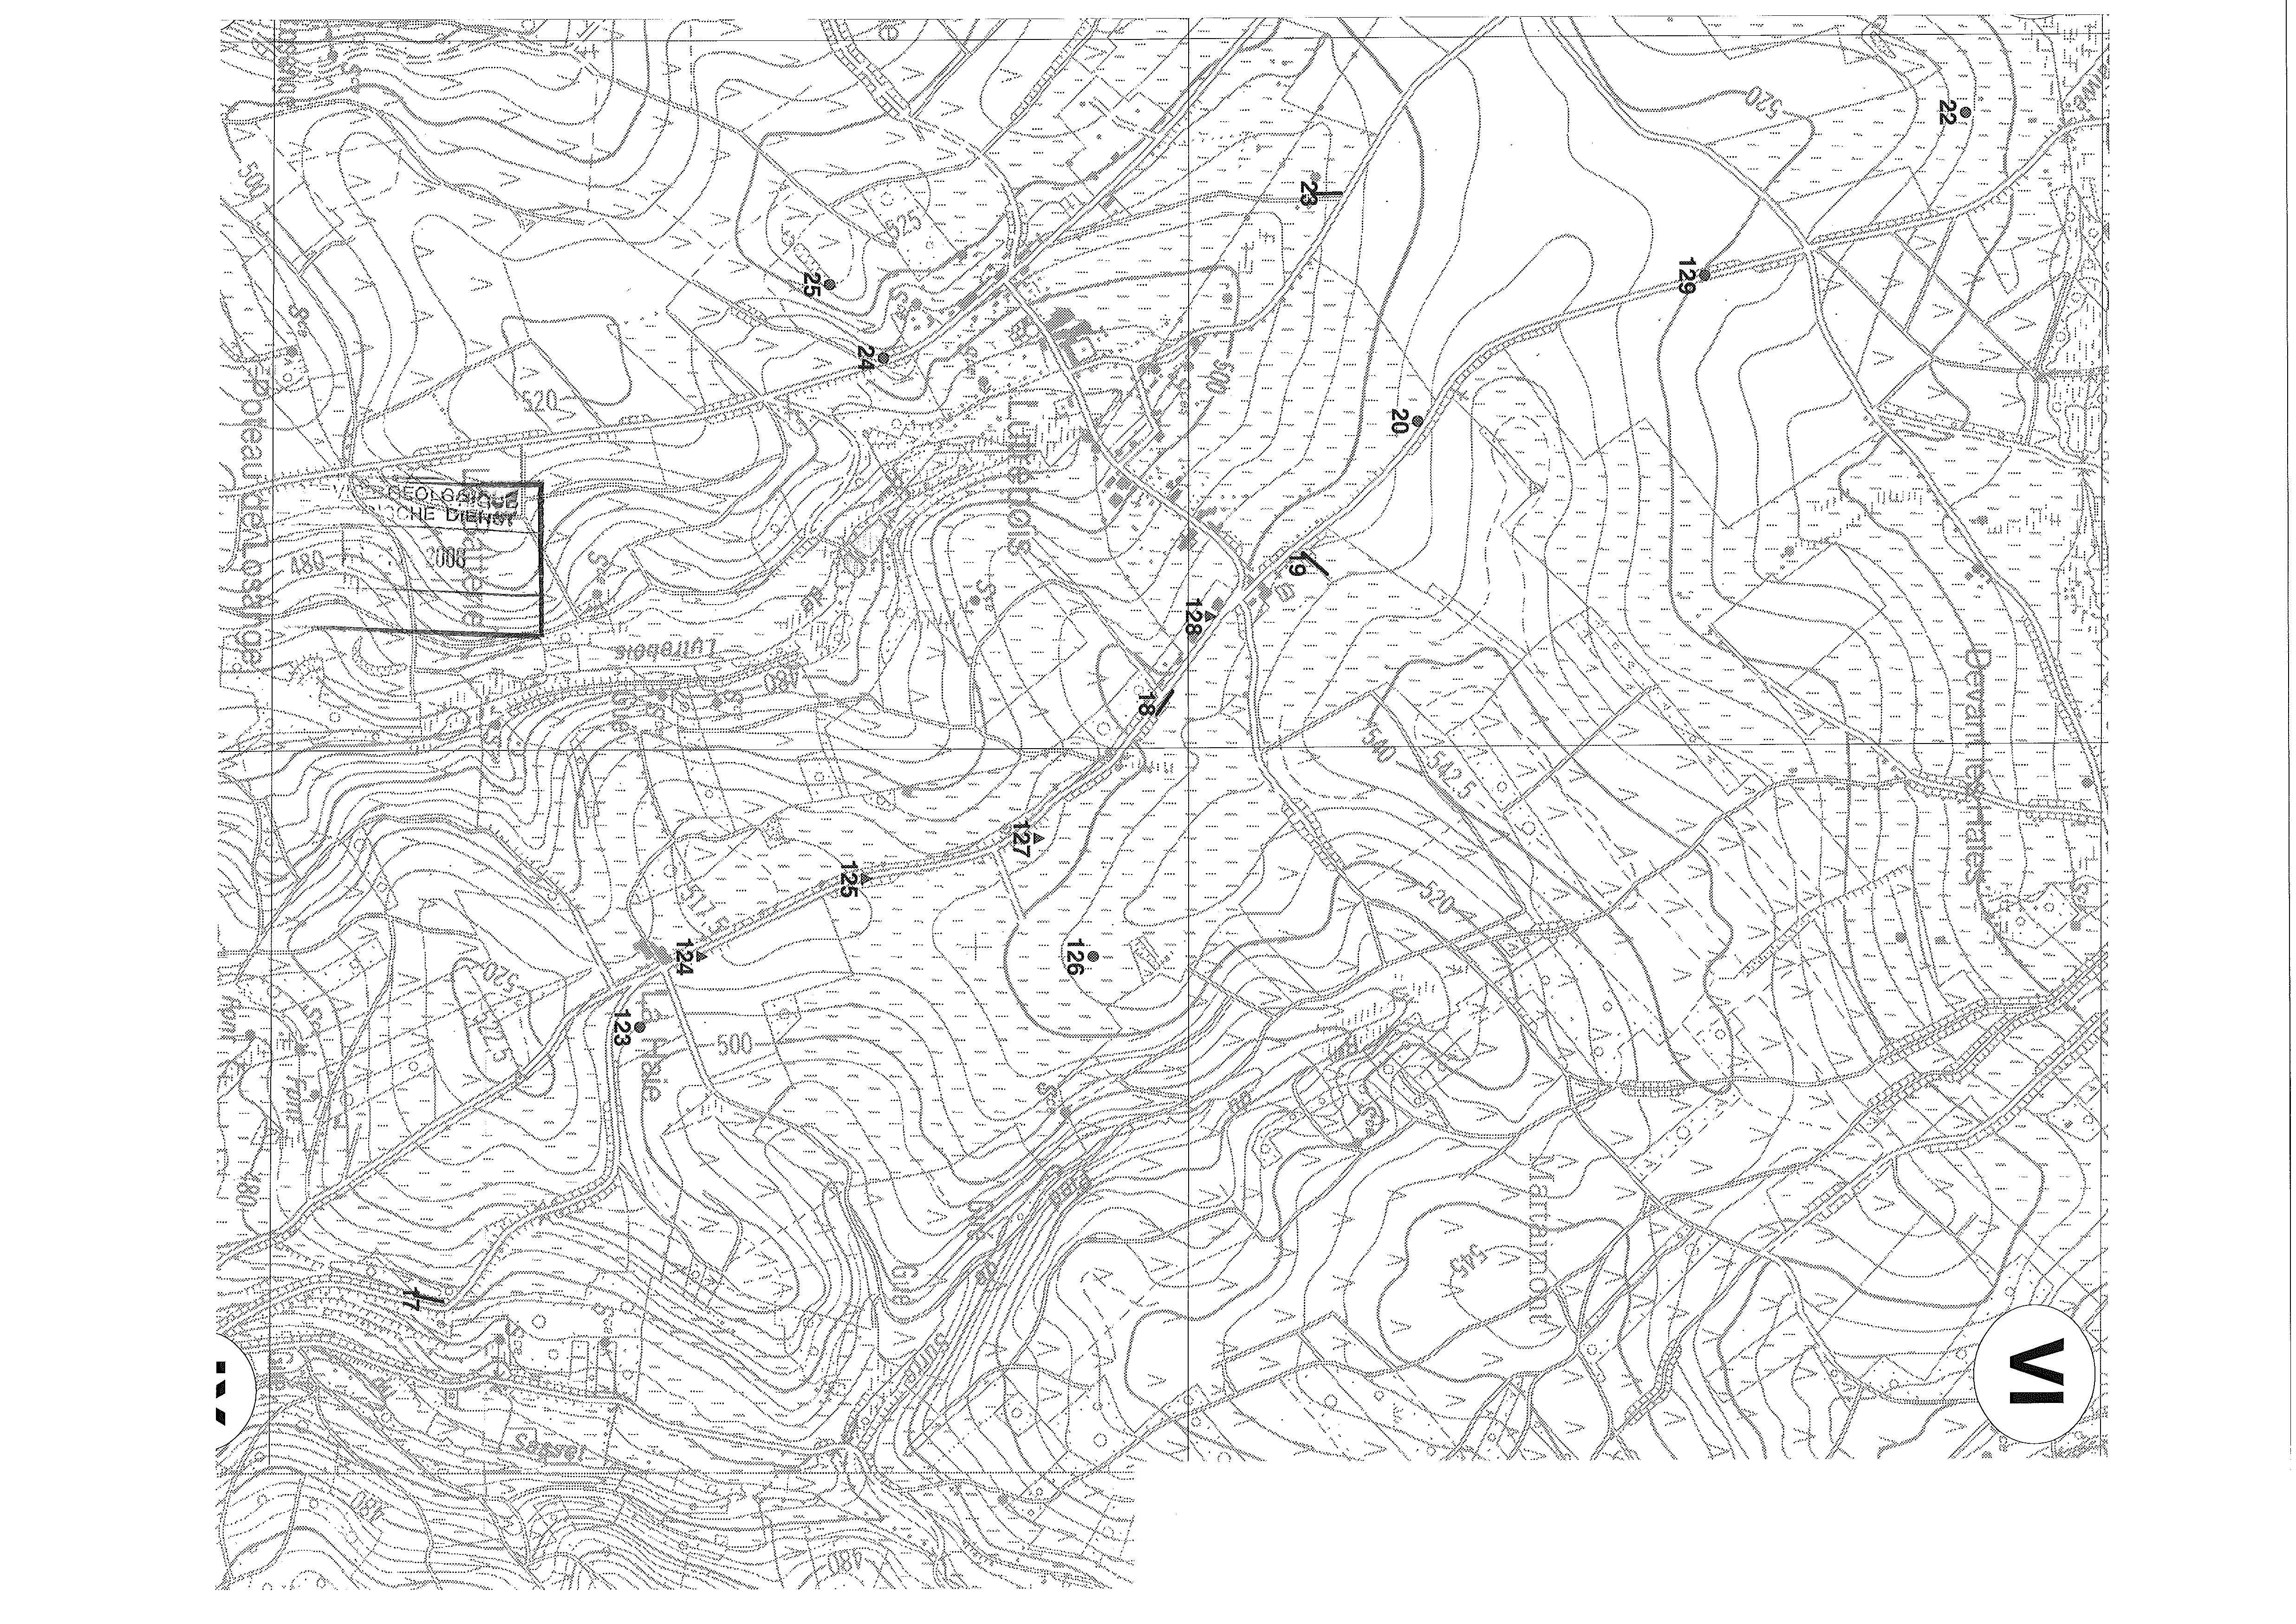 205W_Bastogne_Page_6_Image_0001.jpg